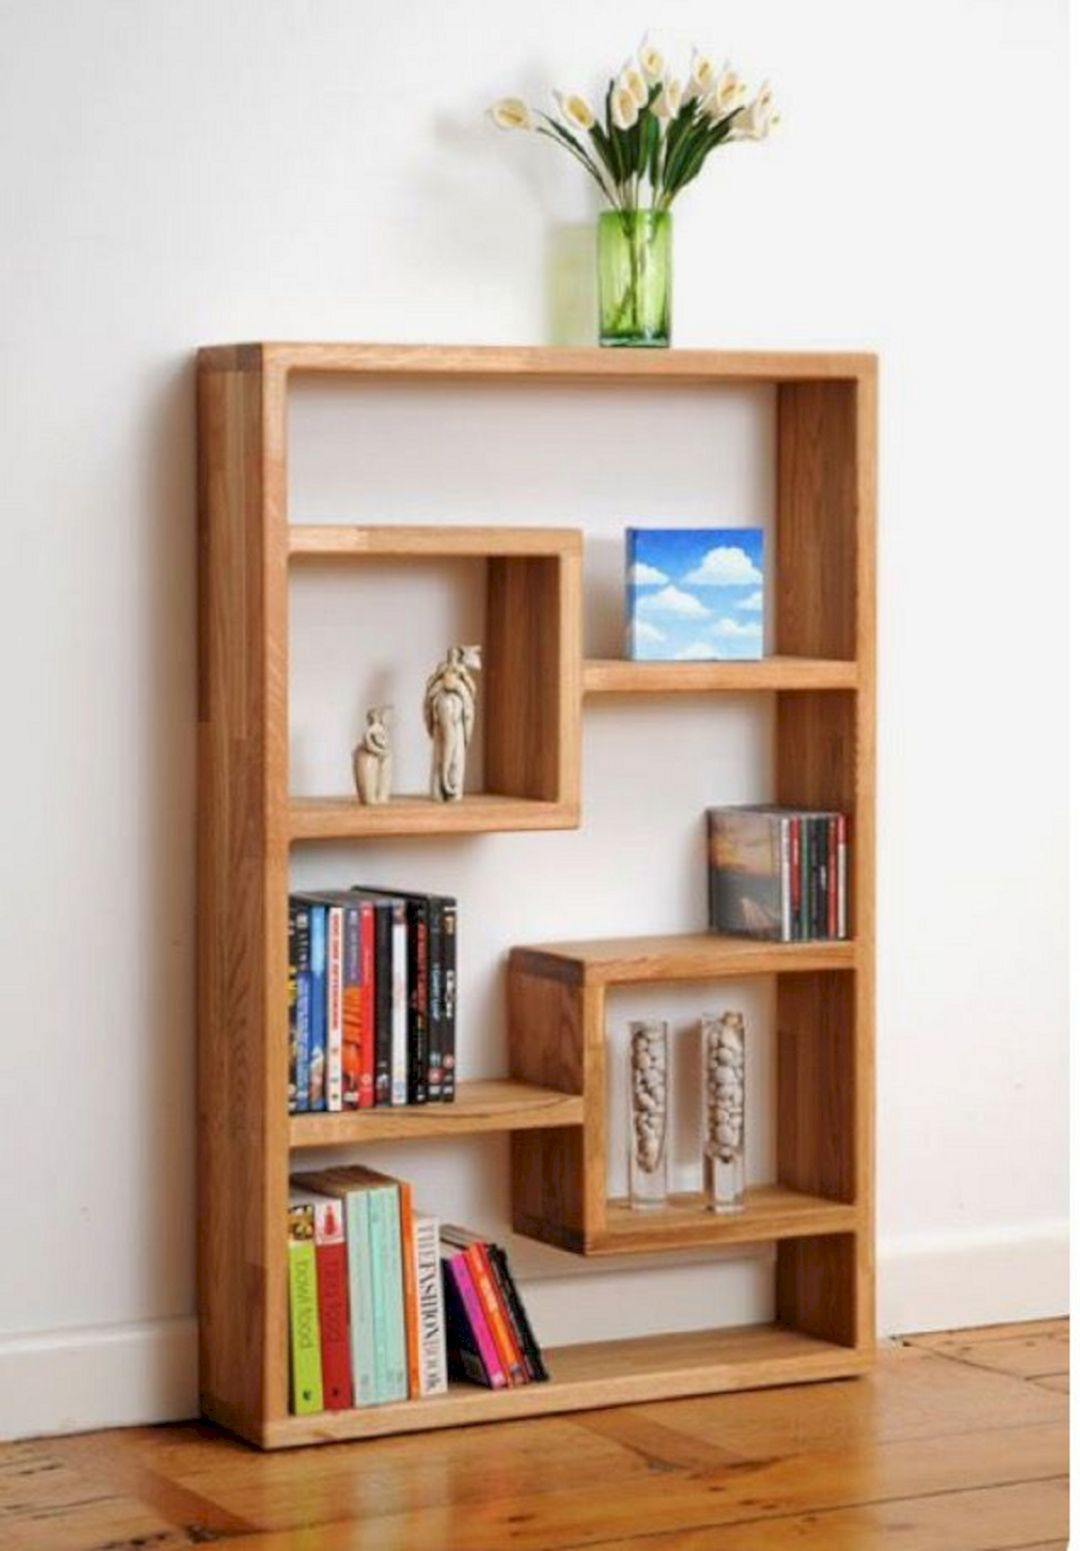 10+ Awesome DIY Bookshelf Design Ideas Anyone Can Do Itself -   16 diy Bookshelf ideas